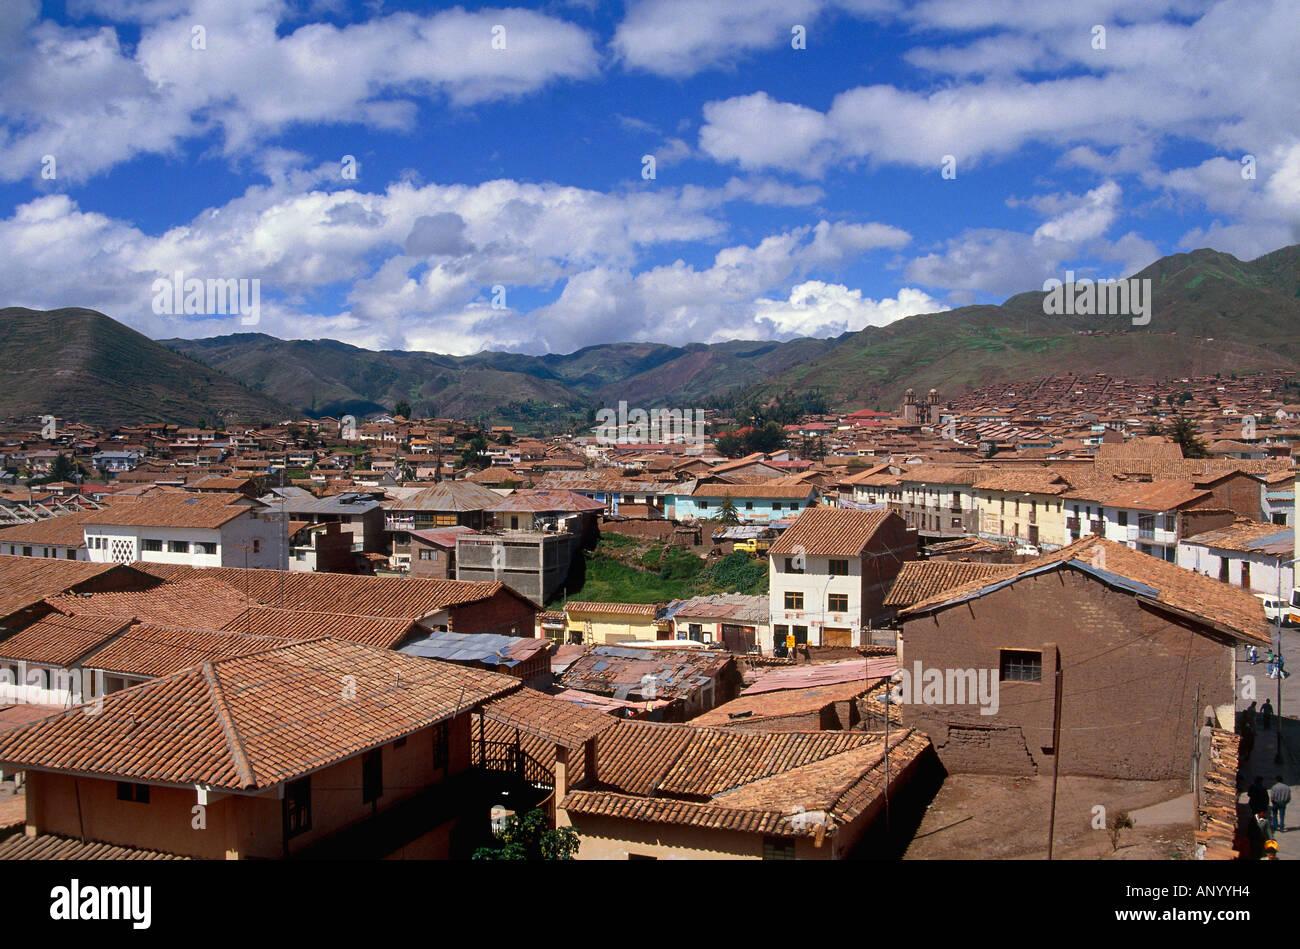 city of cuzco suburb peru - Stock Image